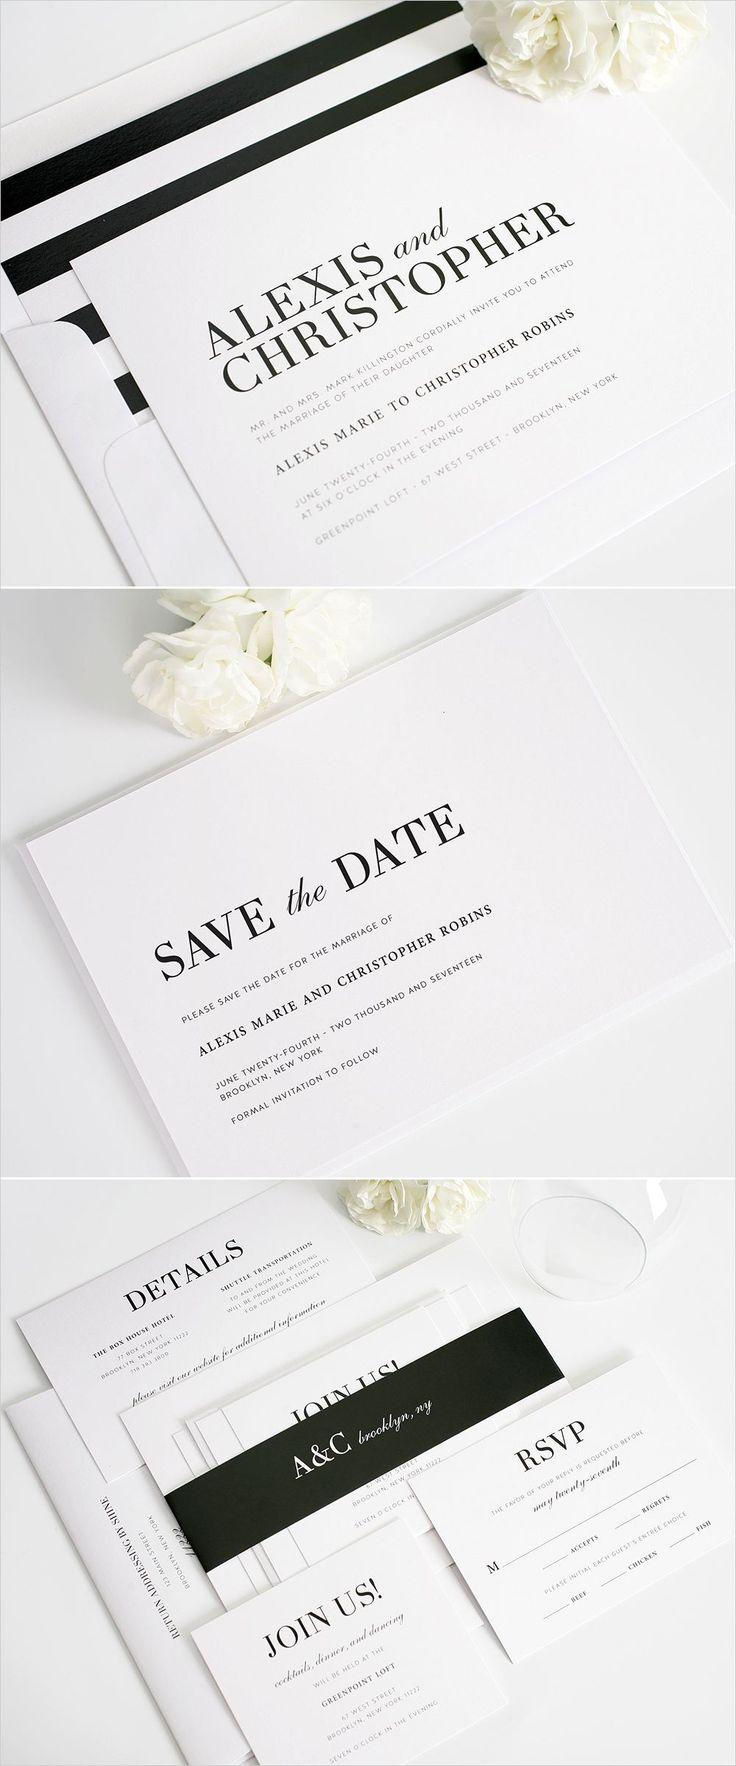 classy wedding invitations classy wedding invitations Sweet spring wedding invitation trends perfect for your wedding